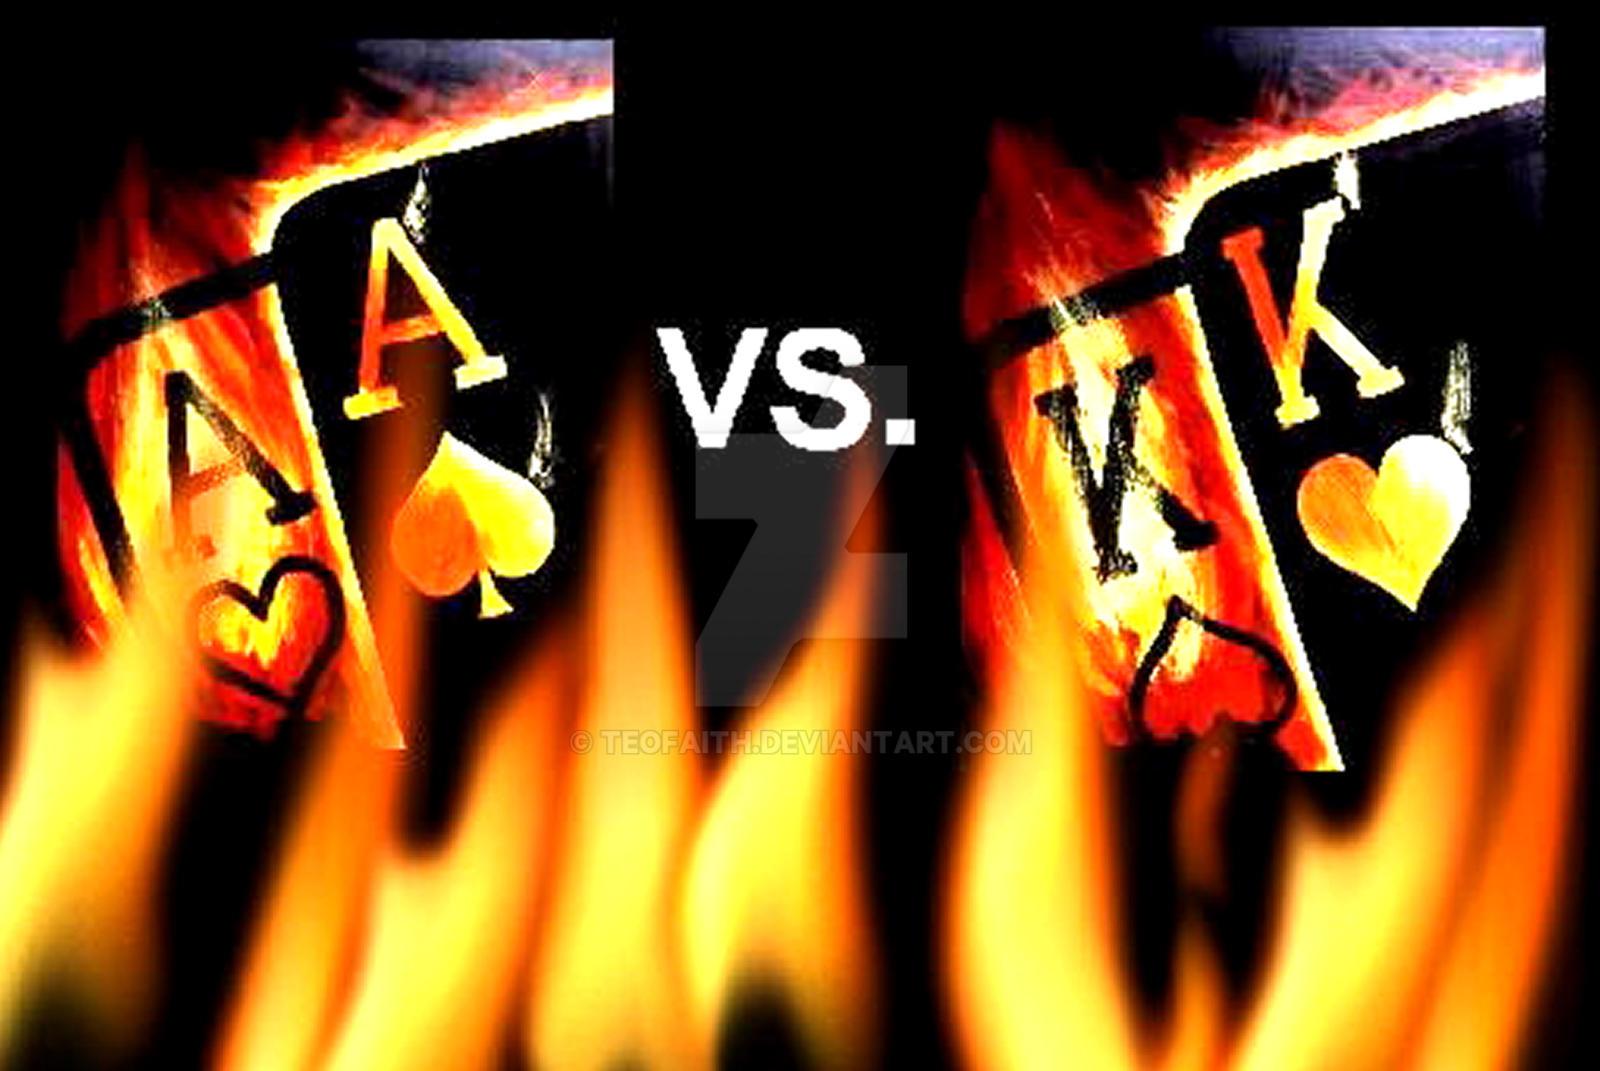 FLAMING ACES VS FLAMING KINGS POKER ART by TEOFAITH